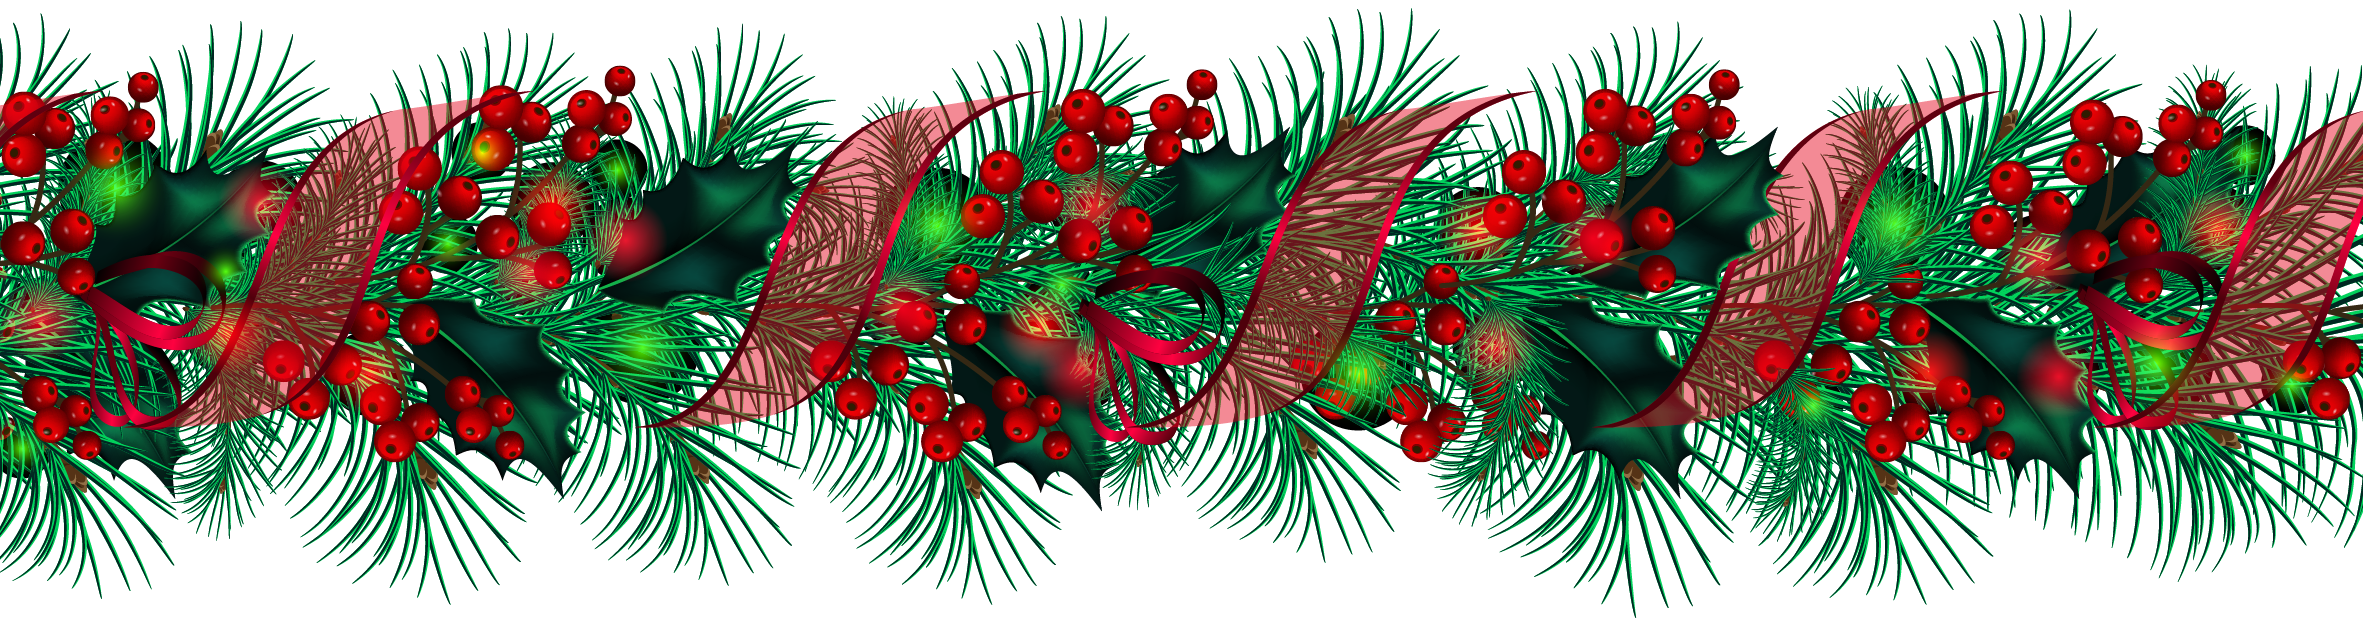 Christmas Greenery Clipart.